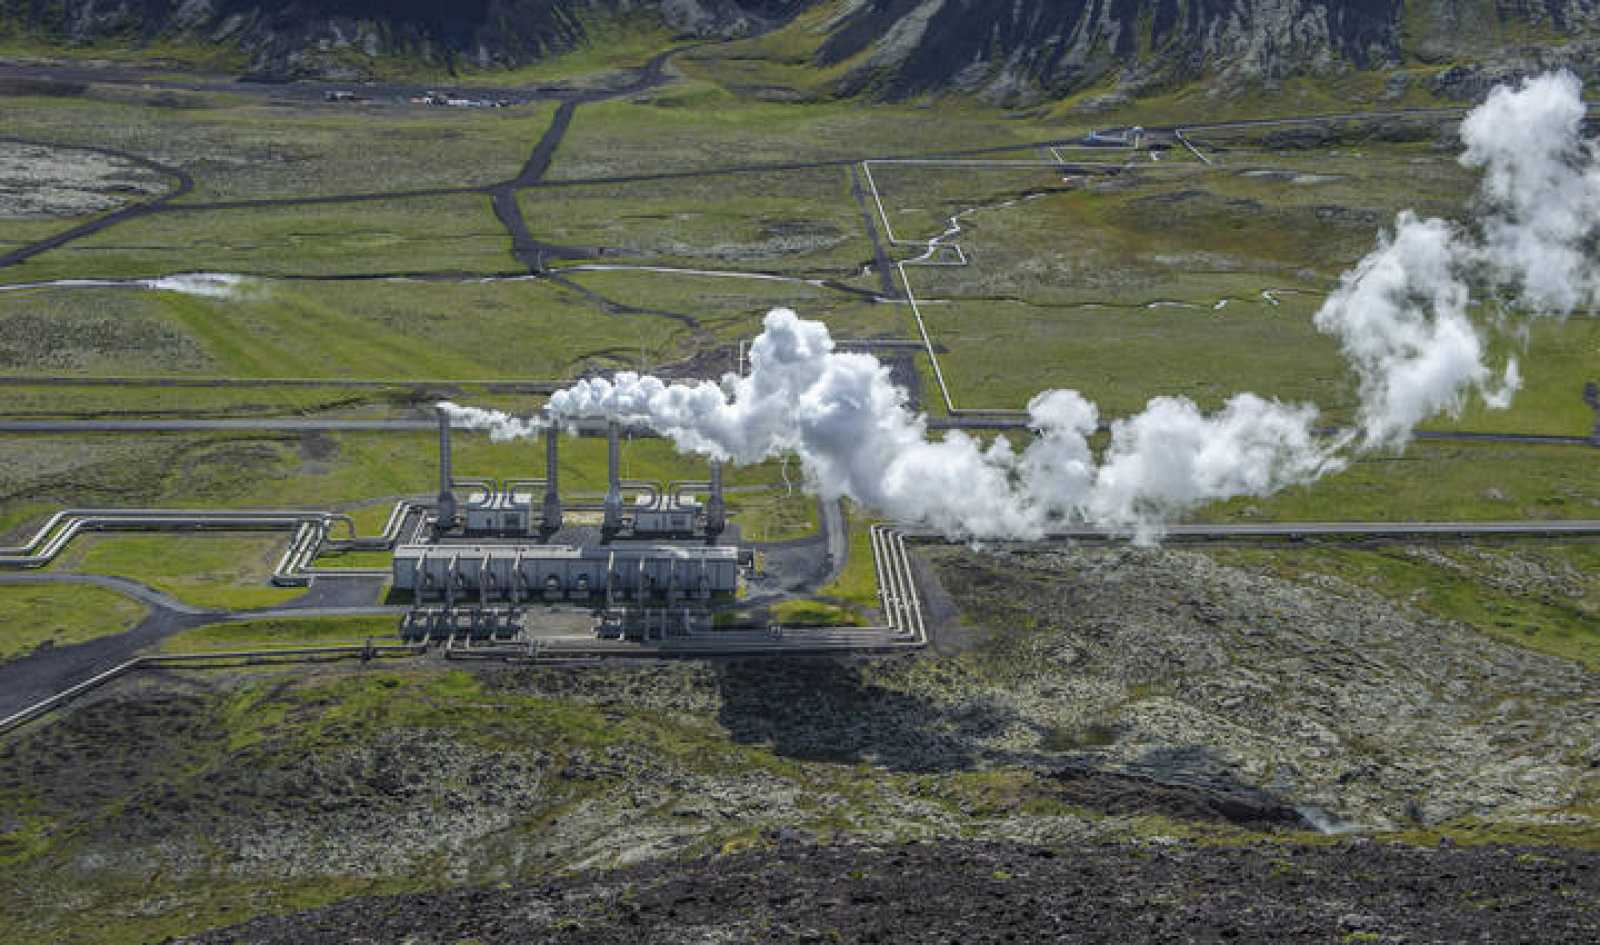 Central de energía geotérmica de Nesjavellir, en Islandia.